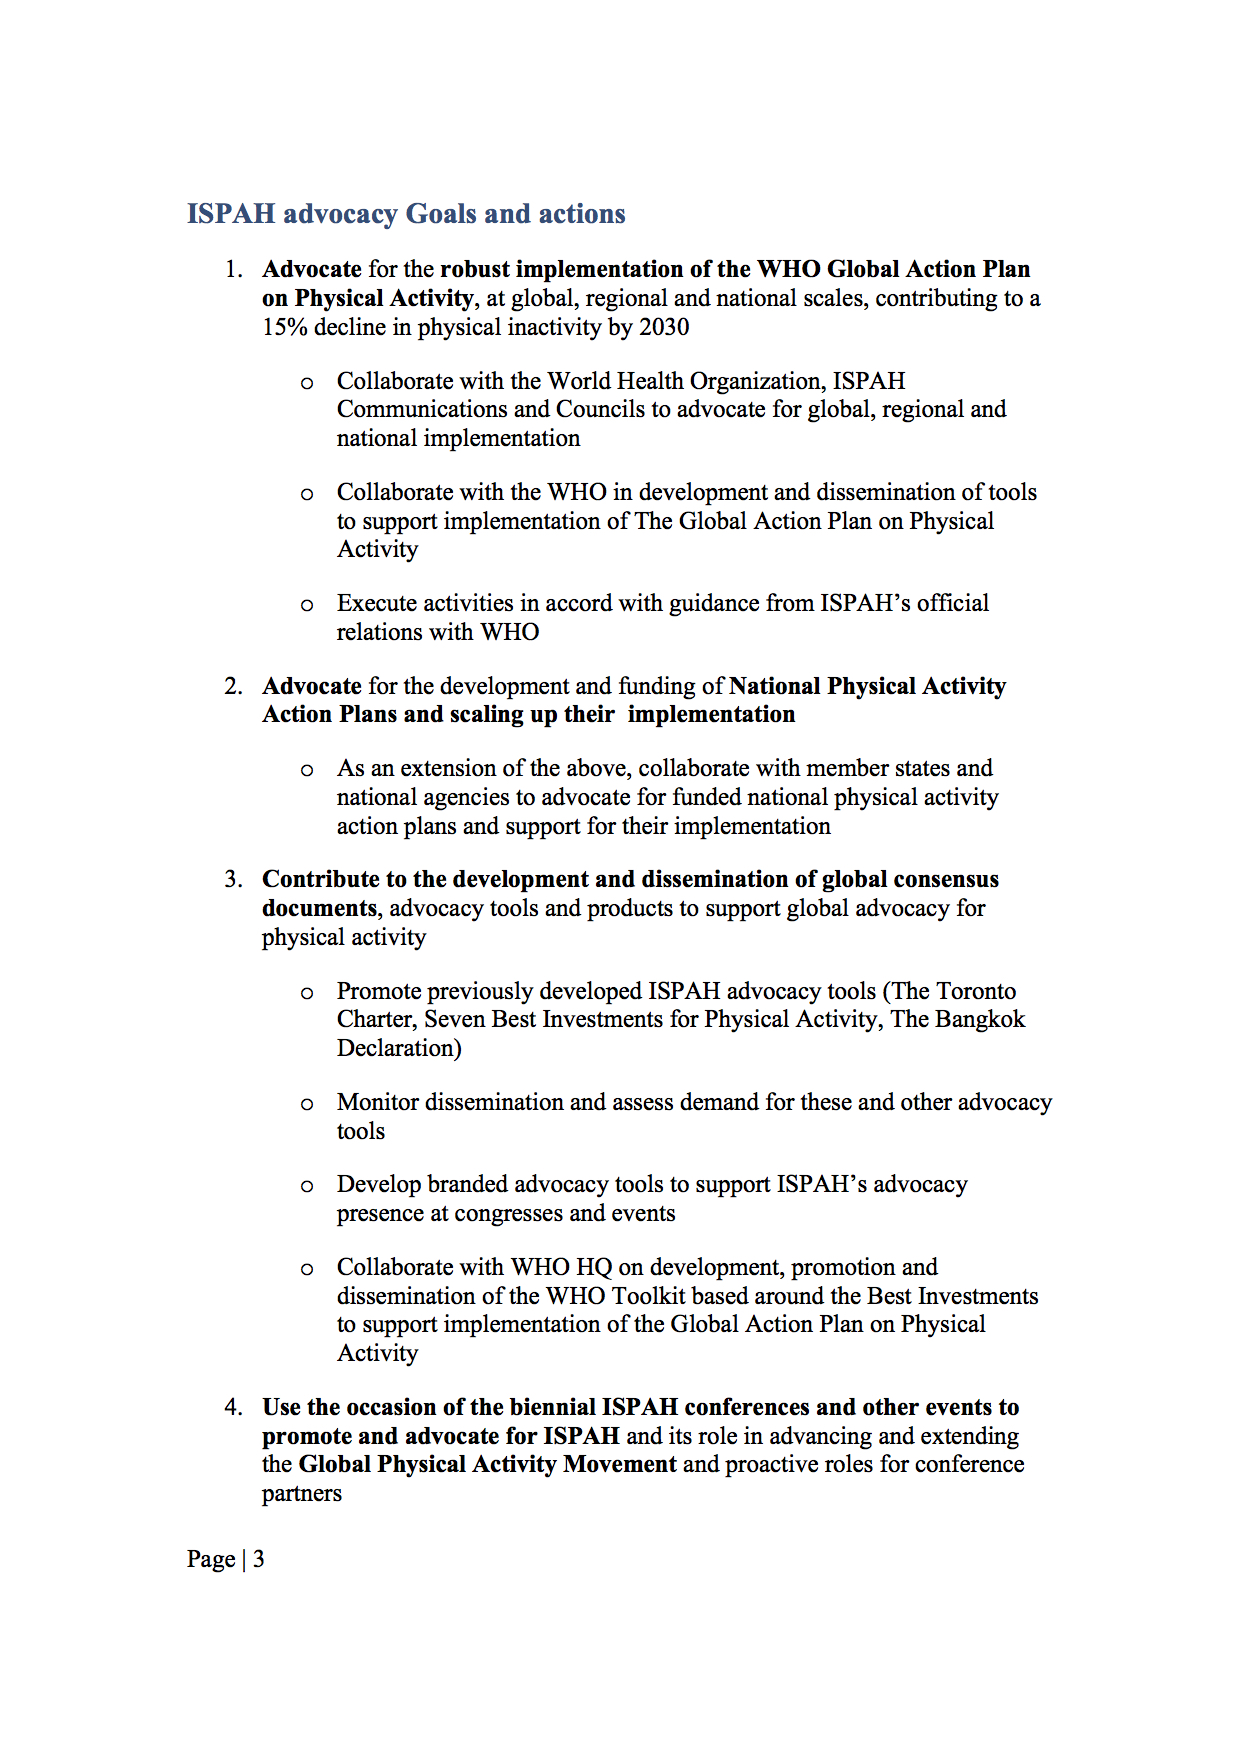 GAPA 2019-2020- Plan_Updated February 2019_3 copy.jpg